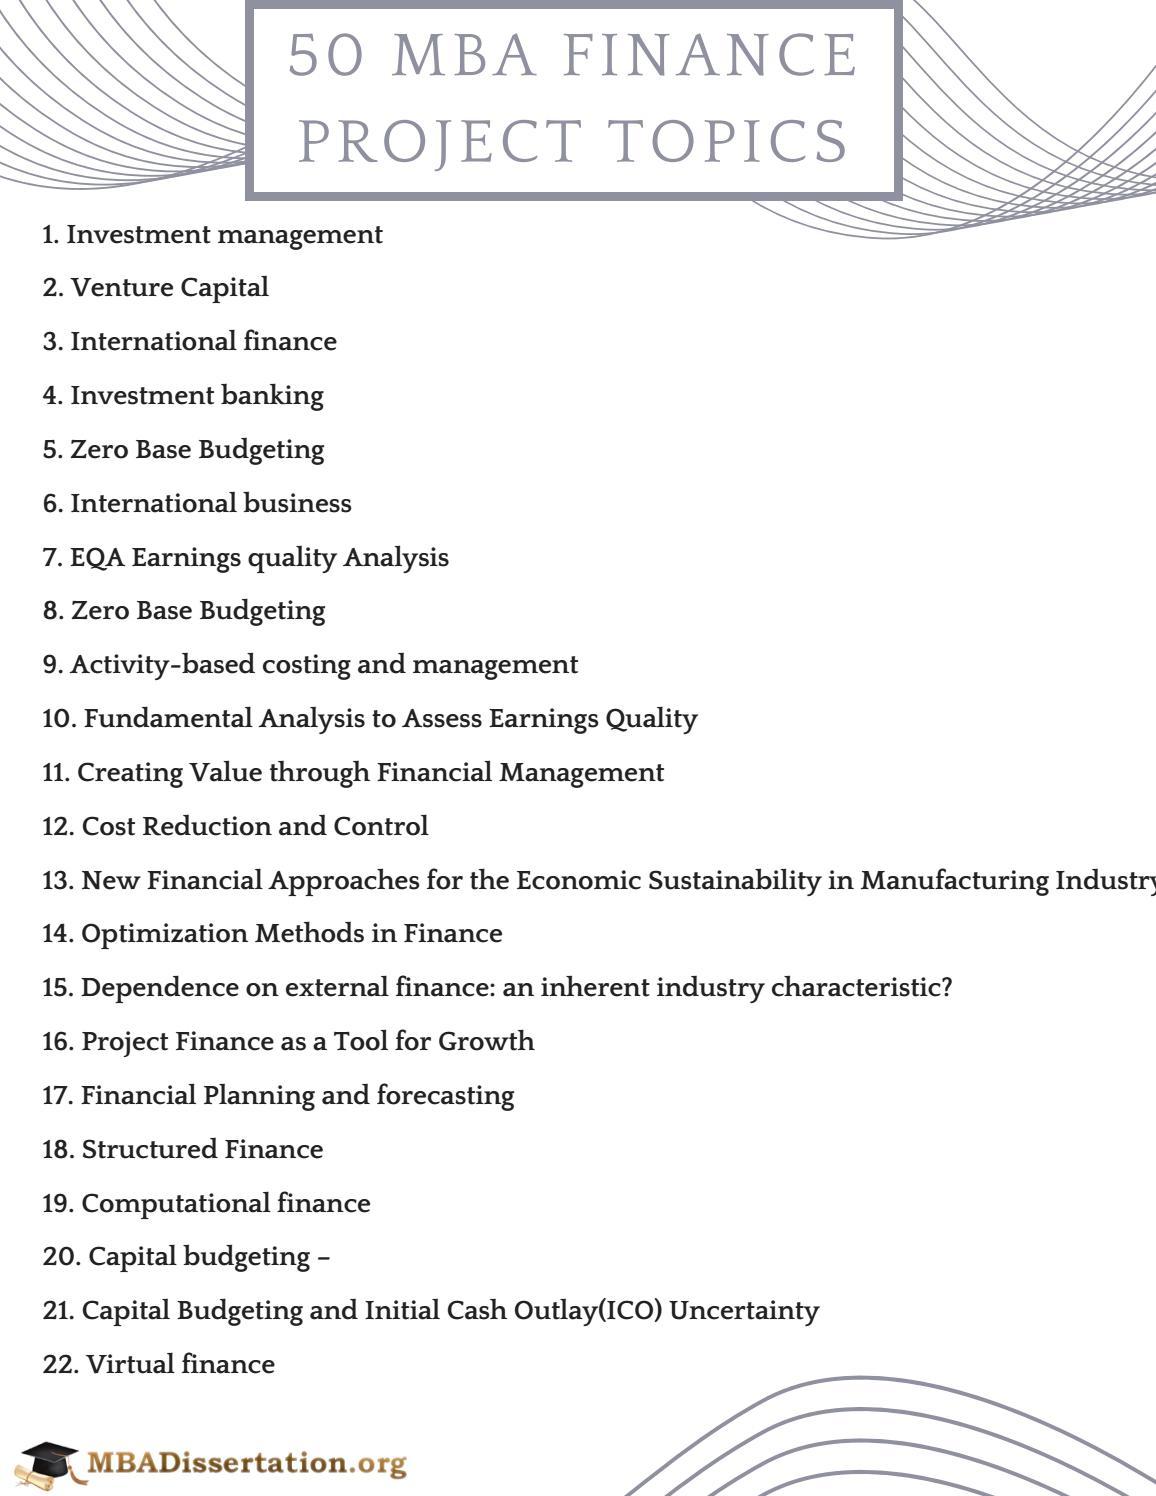 MBA Finance Project Topics by MBADissertationTopics - issuu